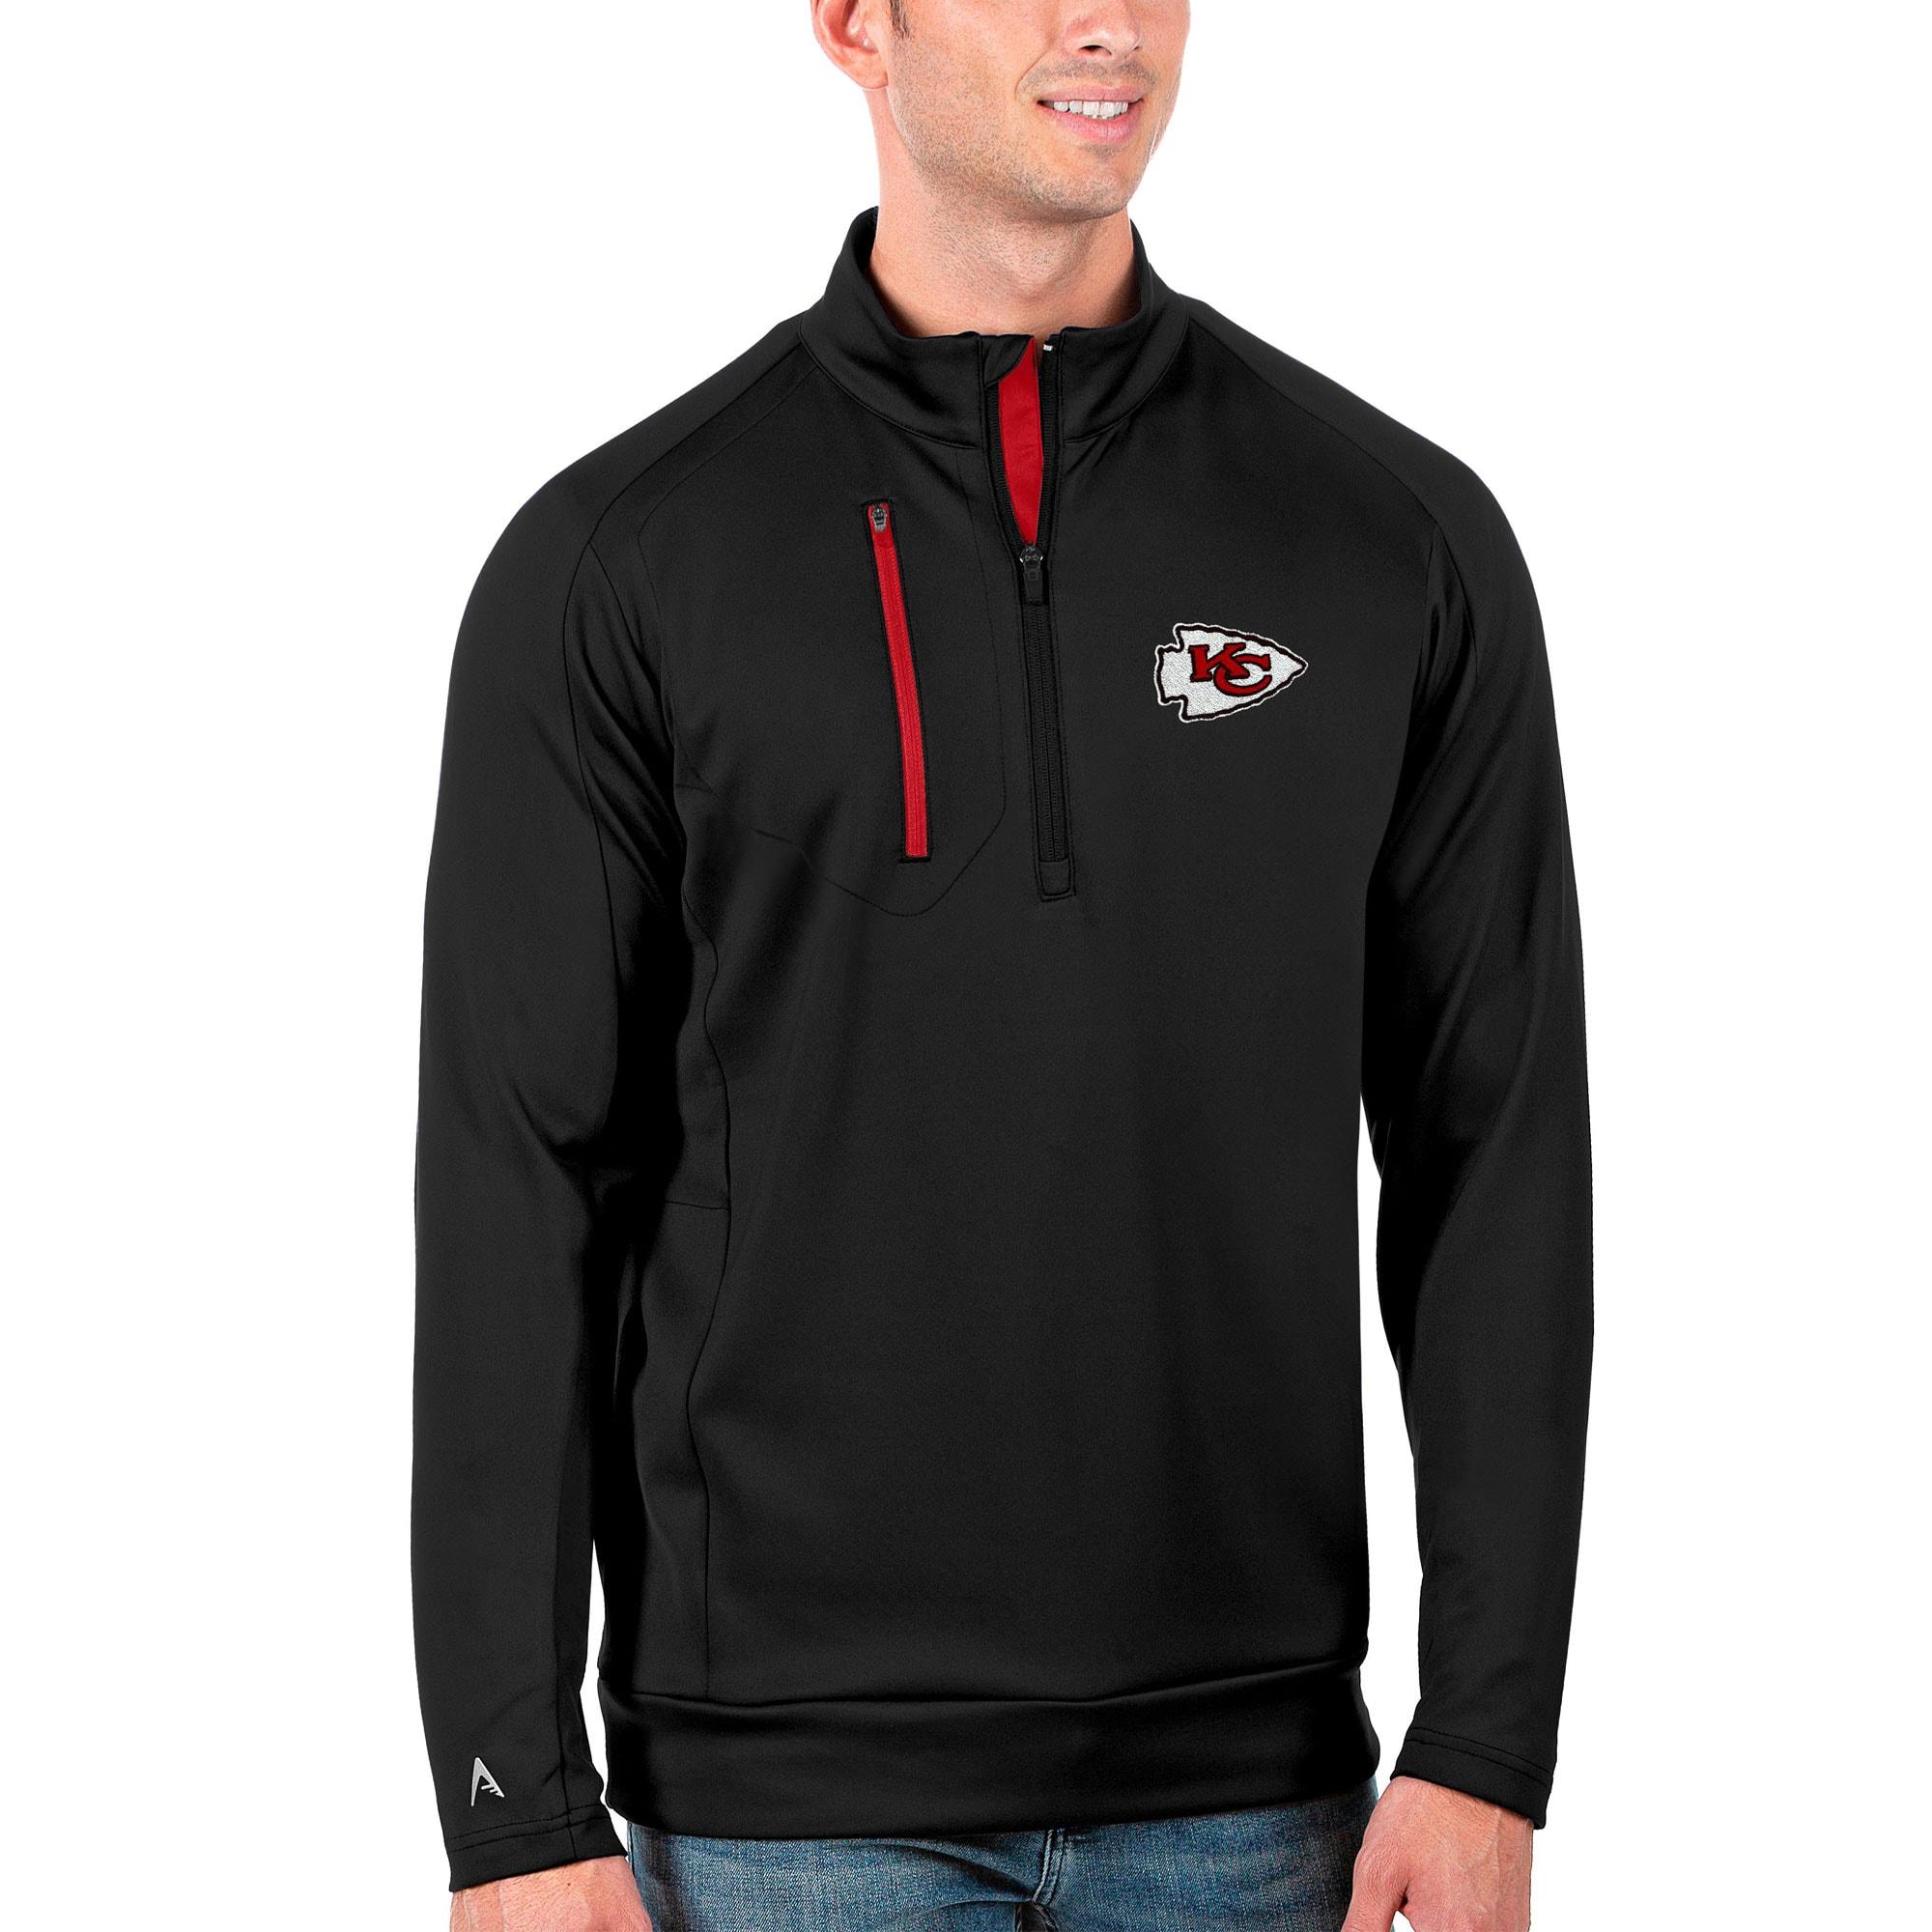 Kansas City Chiefs Antigua Generation Quarter-Zip Pullover Jacket - Black/Red